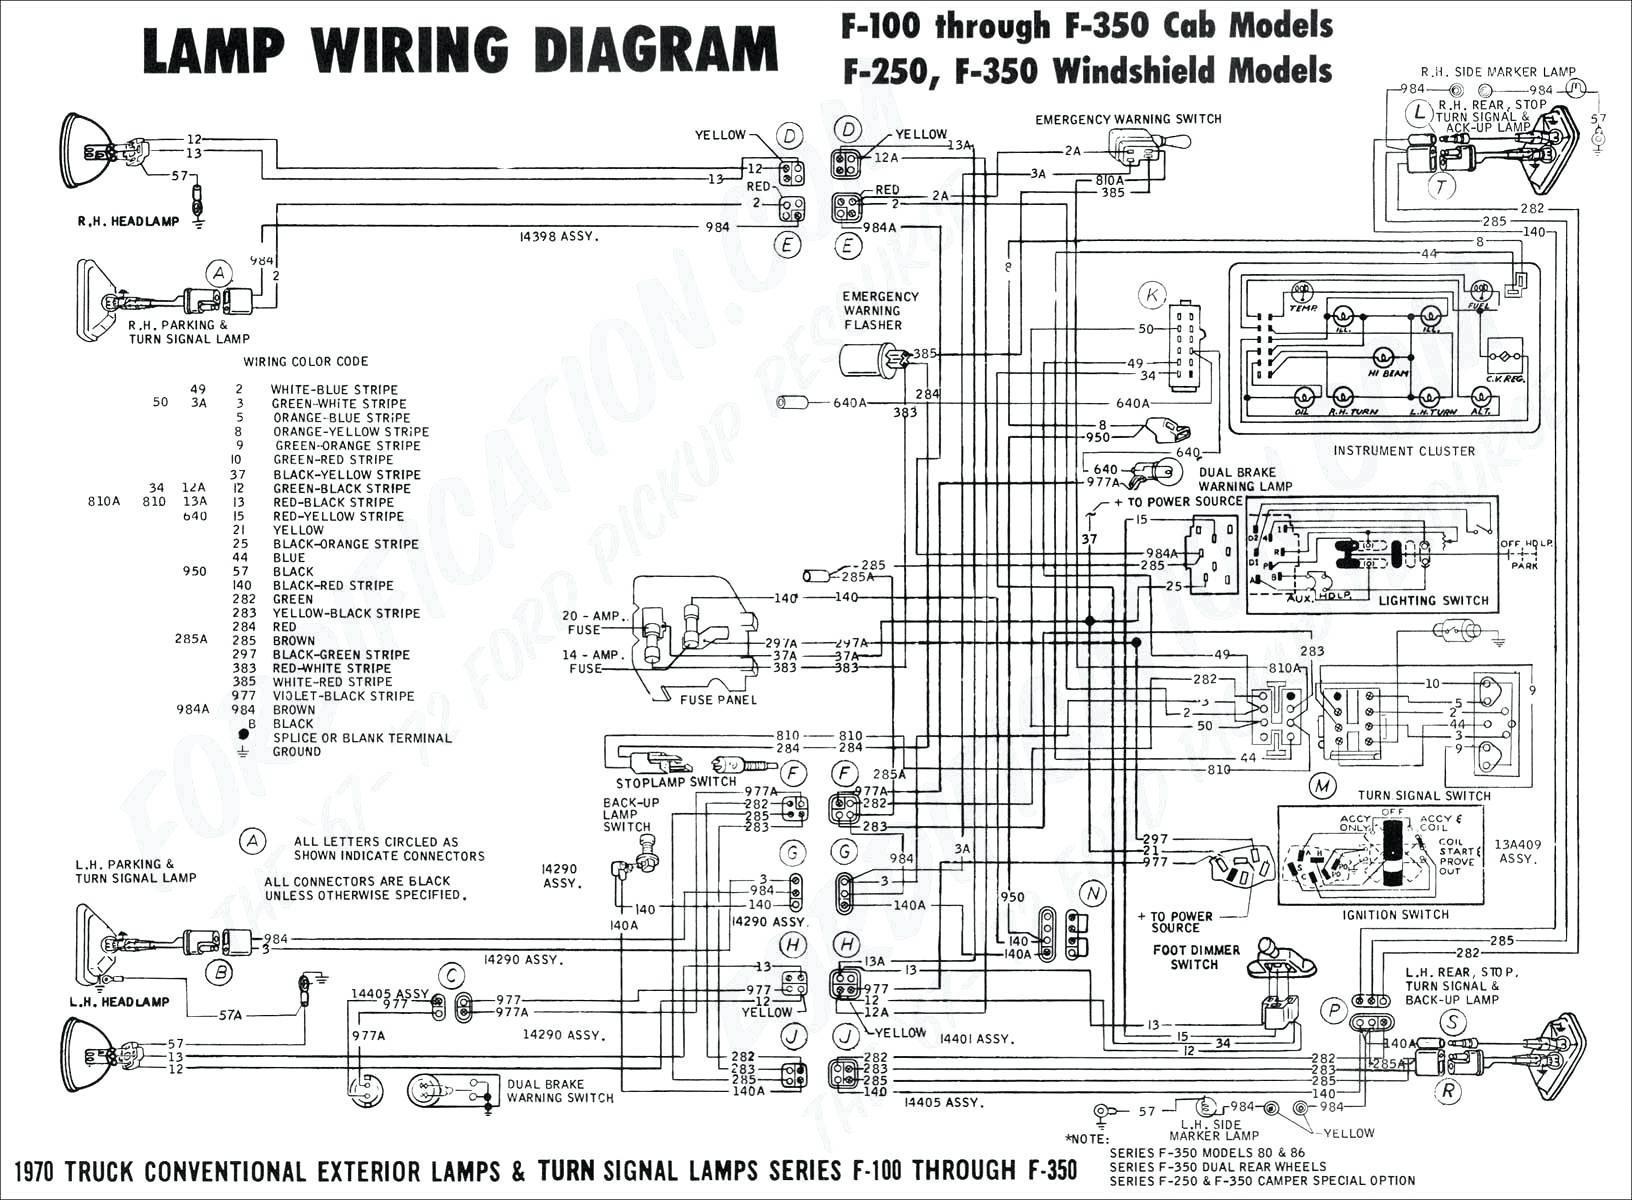 5 7 Liter Chevy Engine Diagram 2 5 Chevy Motor Wiring Diagram Wiring Diagram toolbox Of 5 7 Liter Chevy Engine Diagram